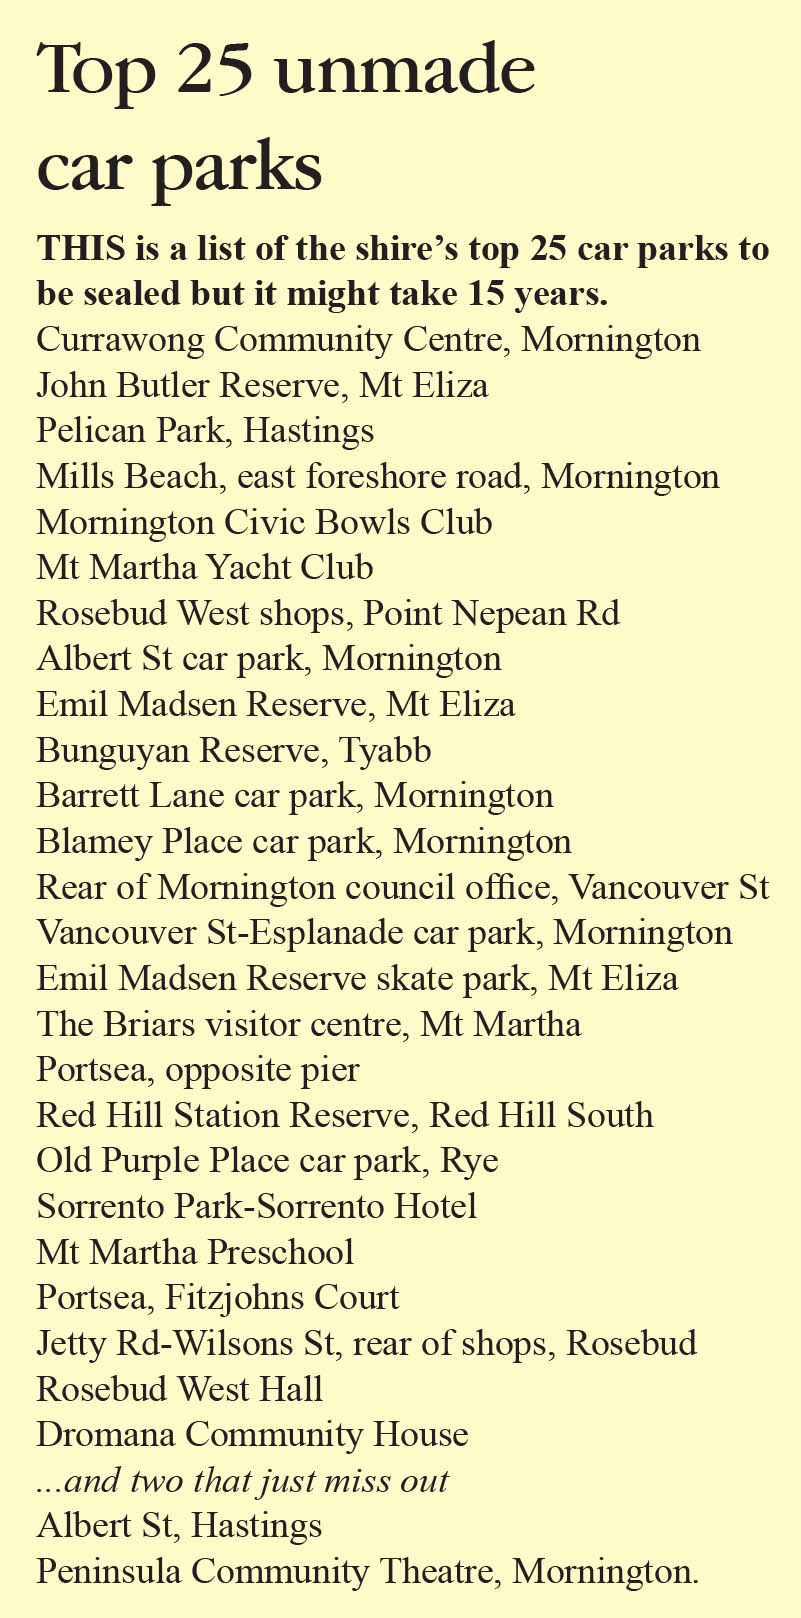 top 25 car parks